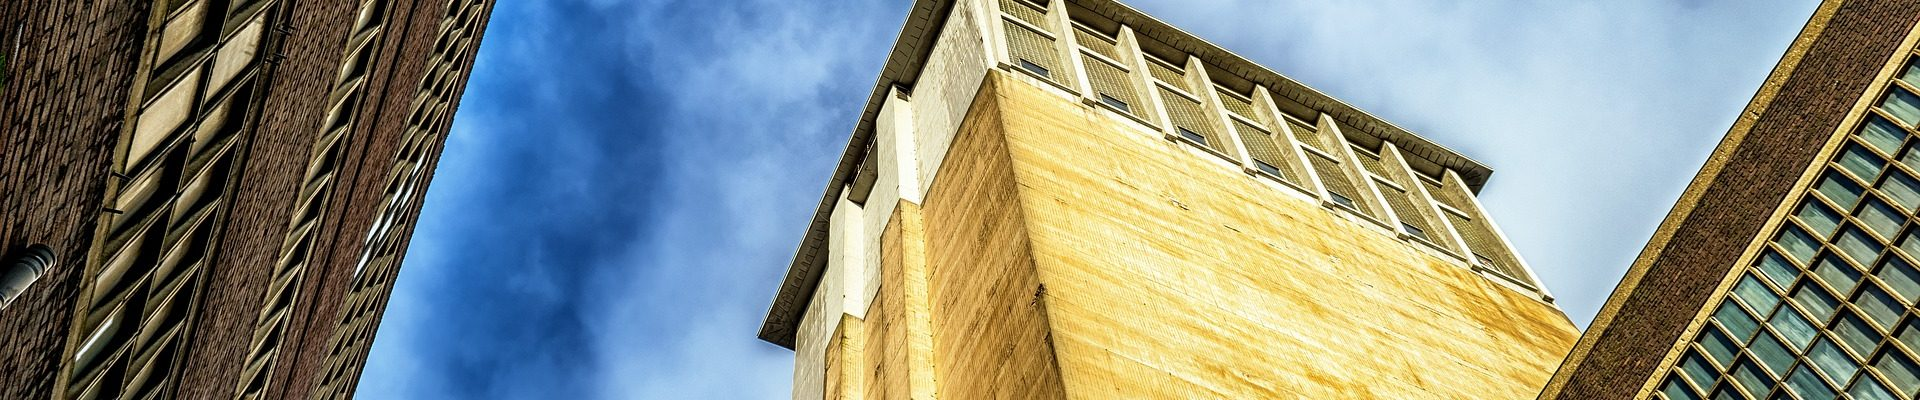 building-1880261_1920